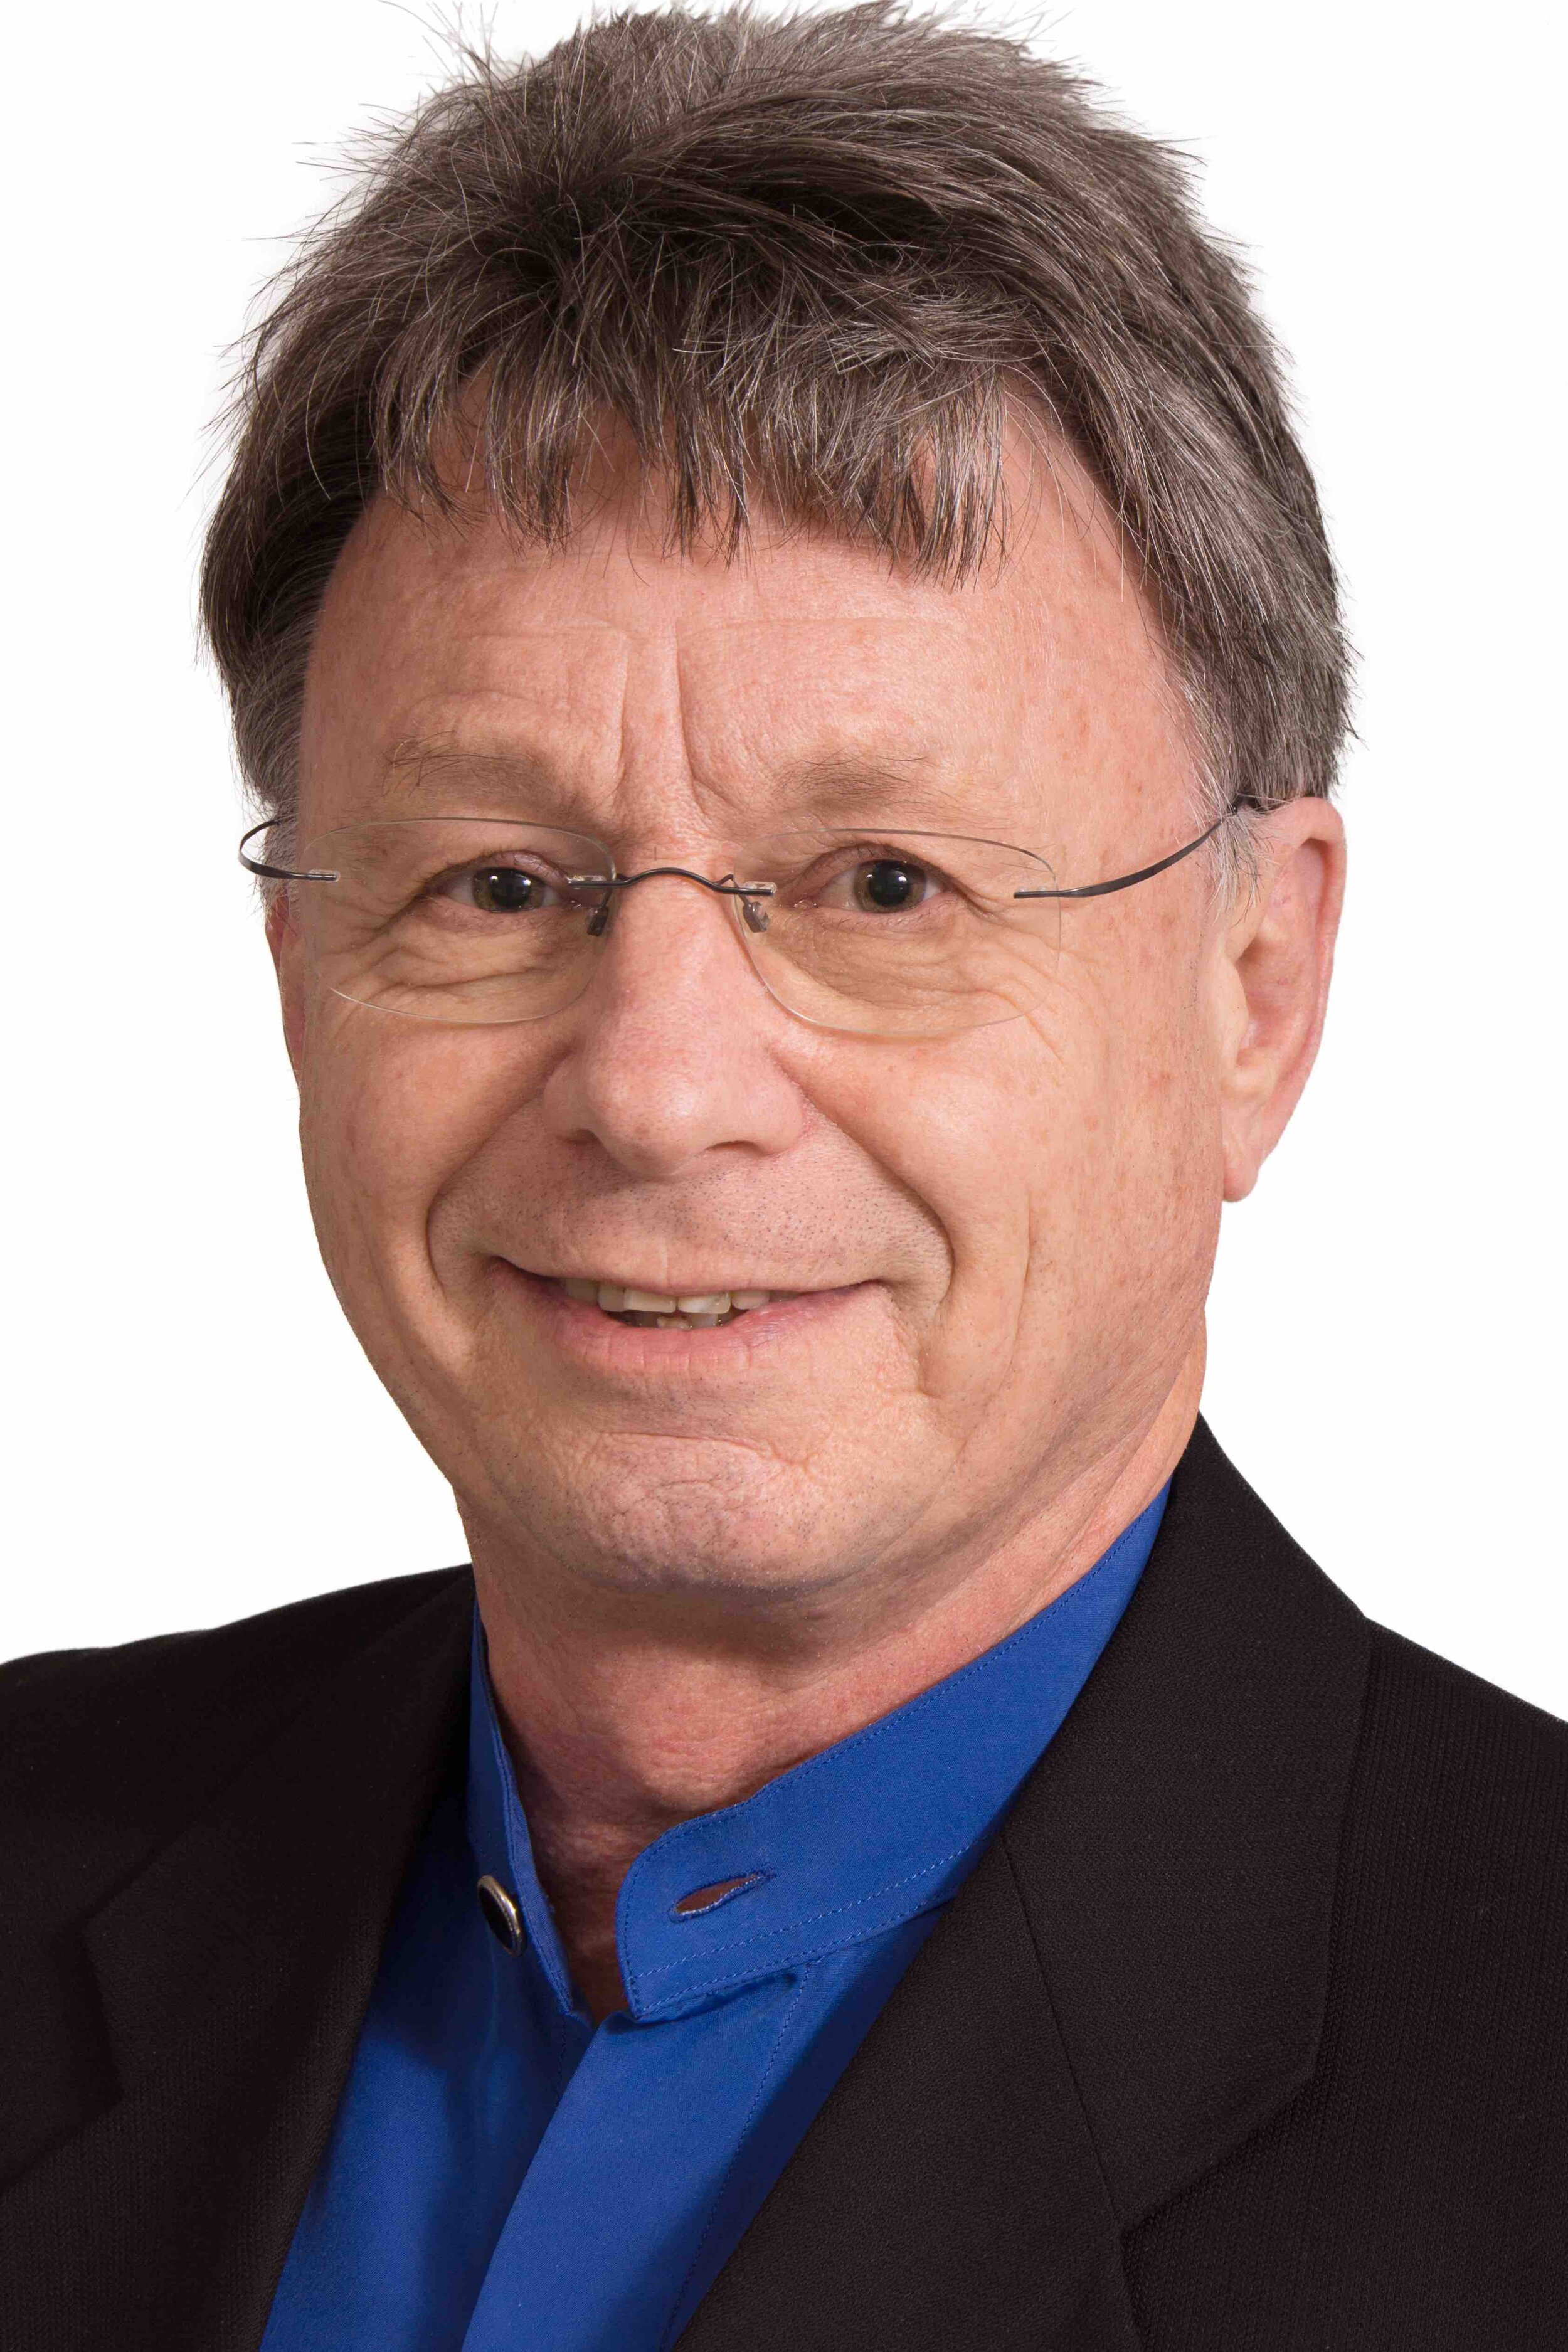 Dean Collier